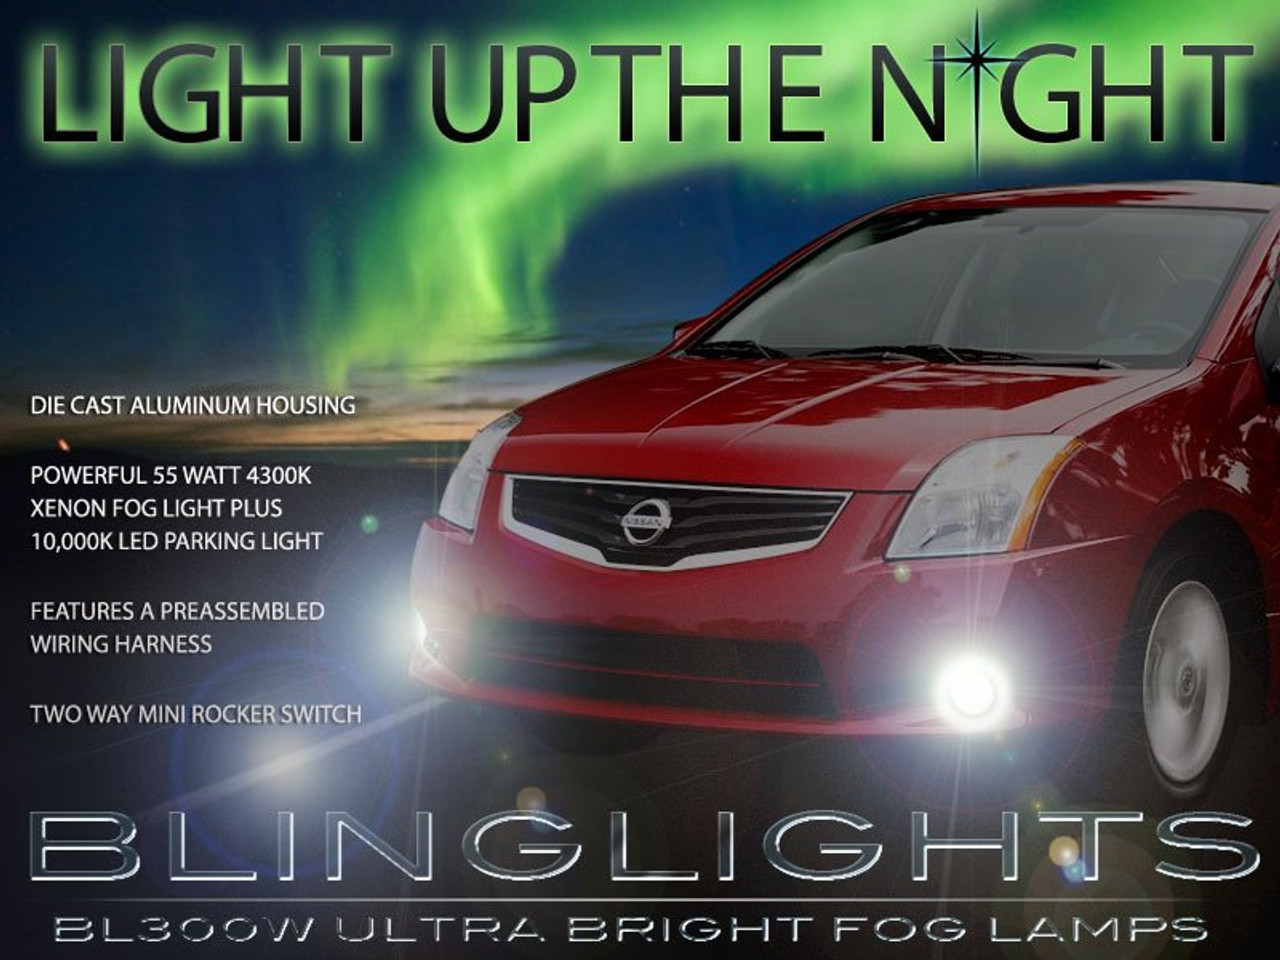 hight resolution of 2007 2008 2009 2010 2011 2012 nissan sentra xenon led fog lamps driving lights foglamps kit blinglights com